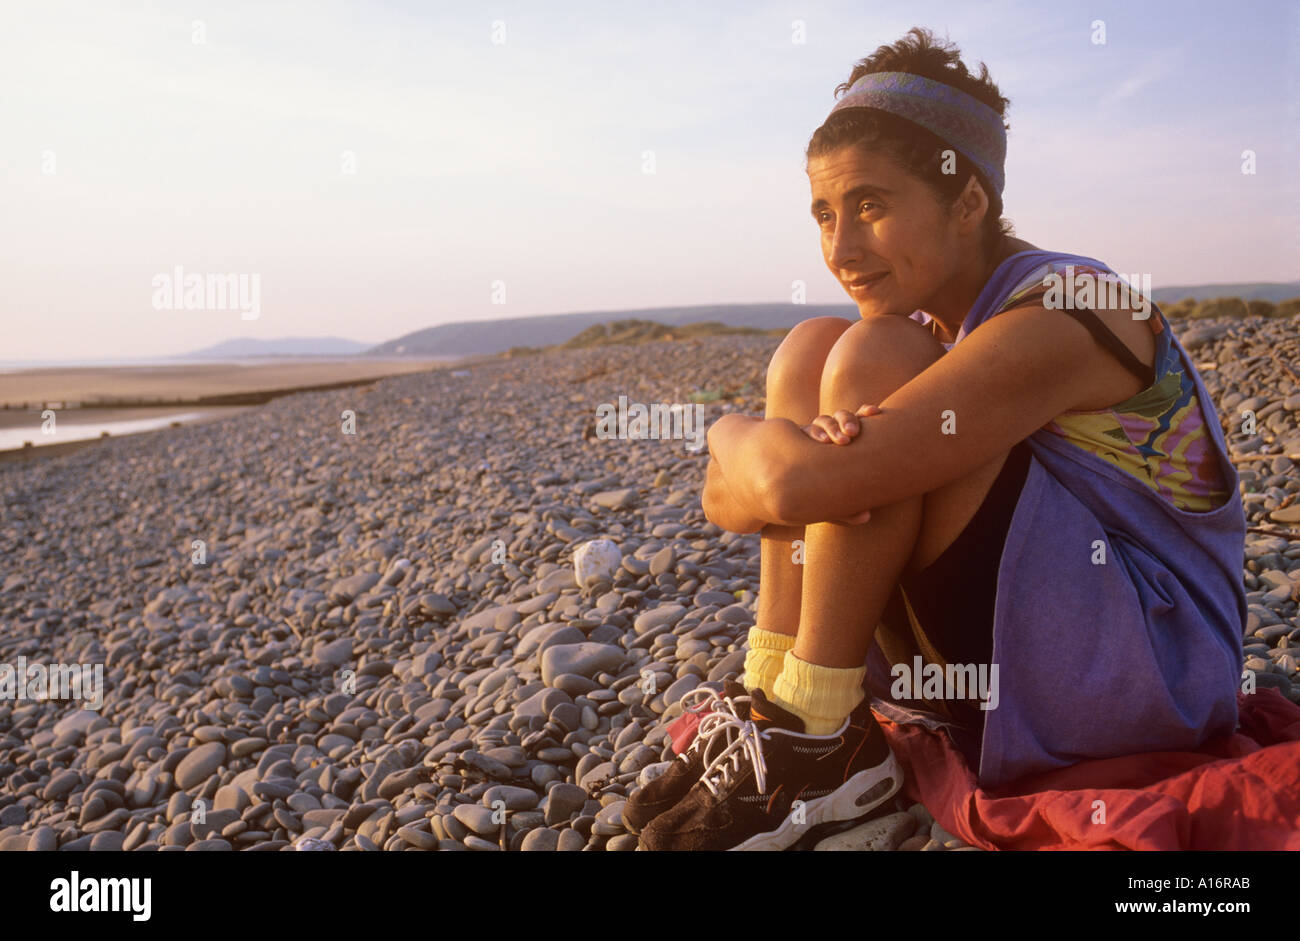 Woman on beach in evening sun - Stock Image